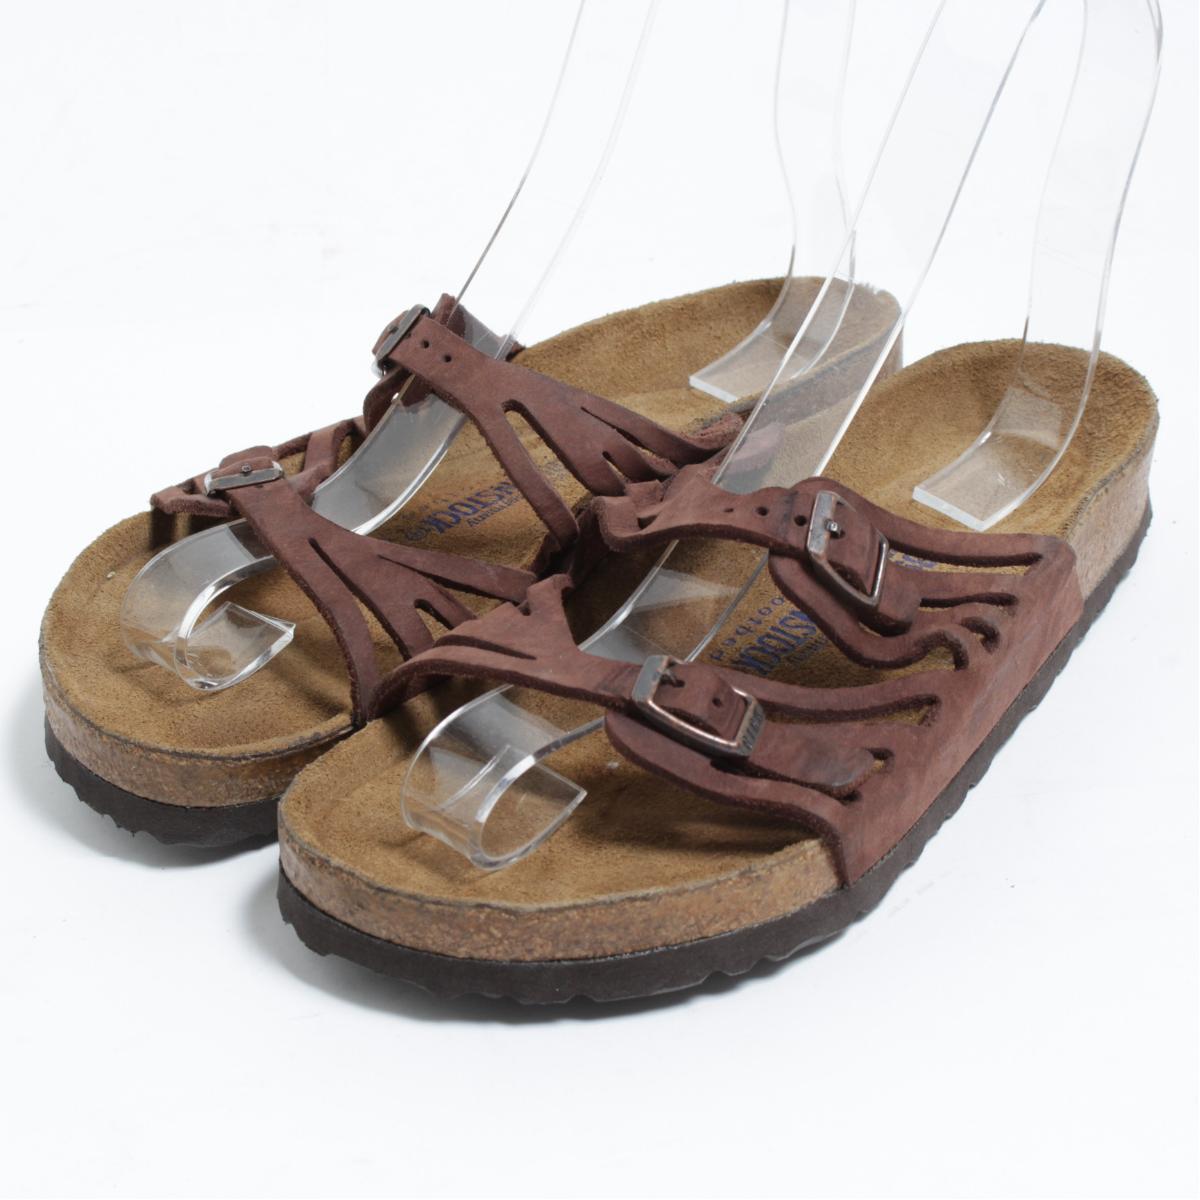 8ab40503770d ビルケンシュトック BIRKENSTOCK Granada Soft Footbed comfort sandals 39 men s 25.0cm   bon0680